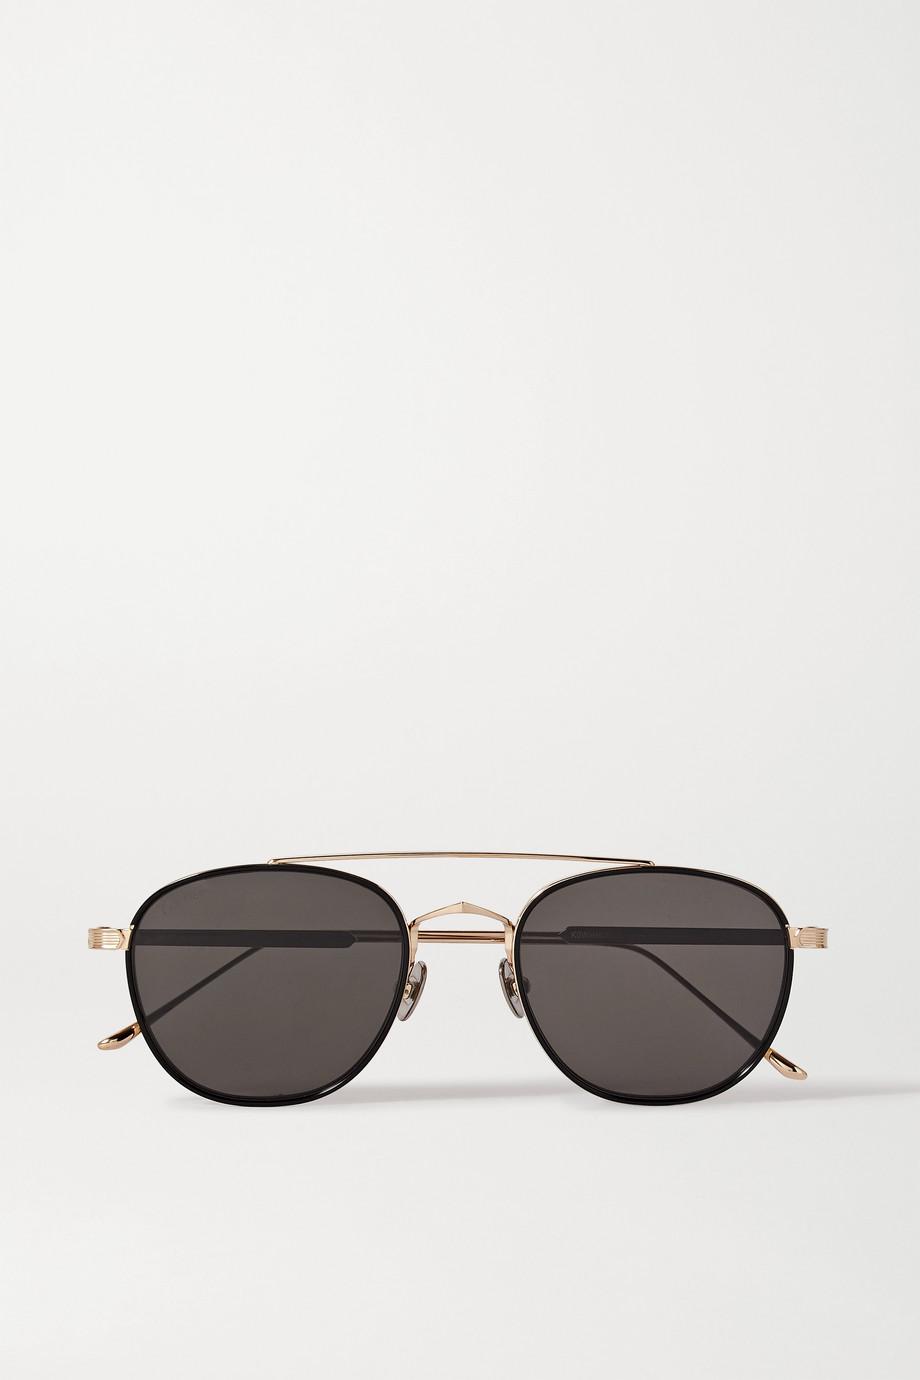 Cartier Eyewear Pilotensonnenbrille aus goldfarbenem Metall und Azetat